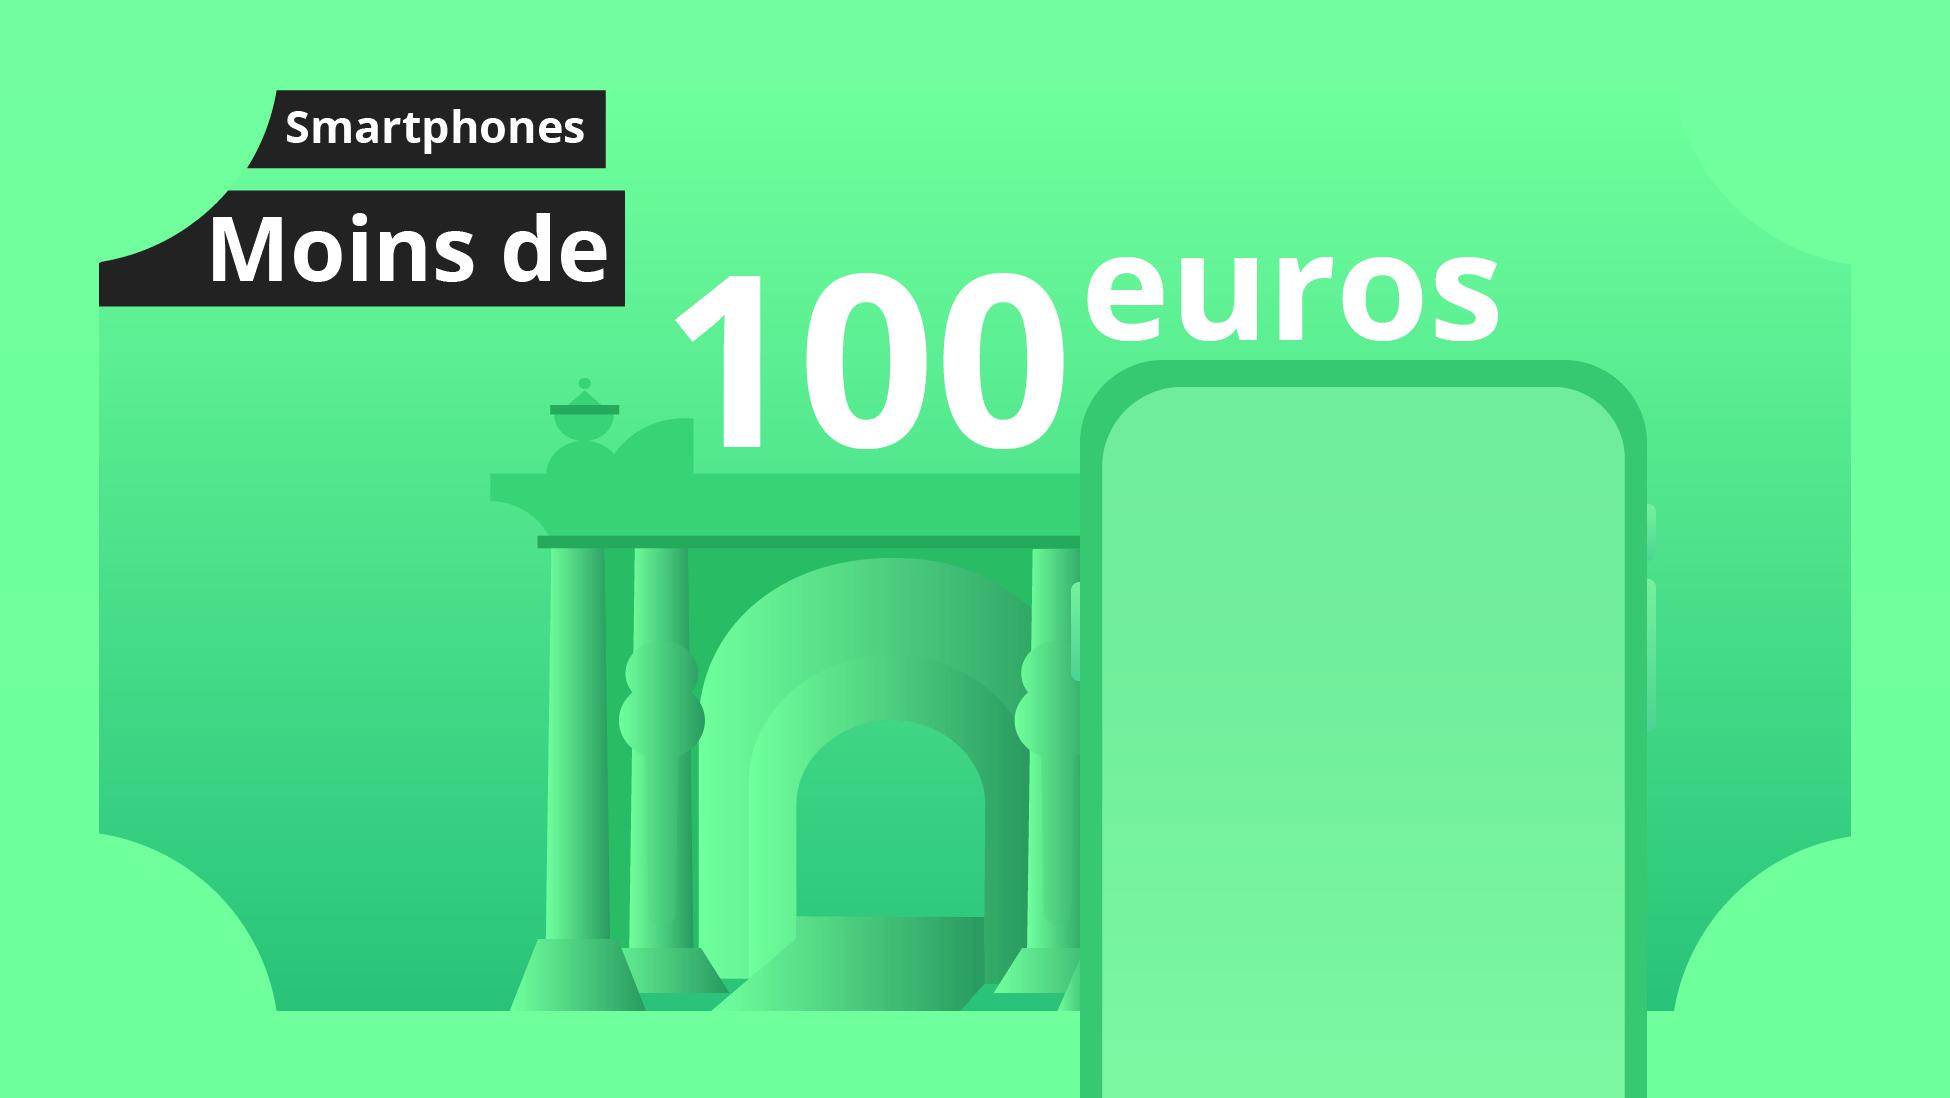 les meilleurs smartphones android moins de 100 euros en 2018 frandroid. Black Bedroom Furniture Sets. Home Design Ideas